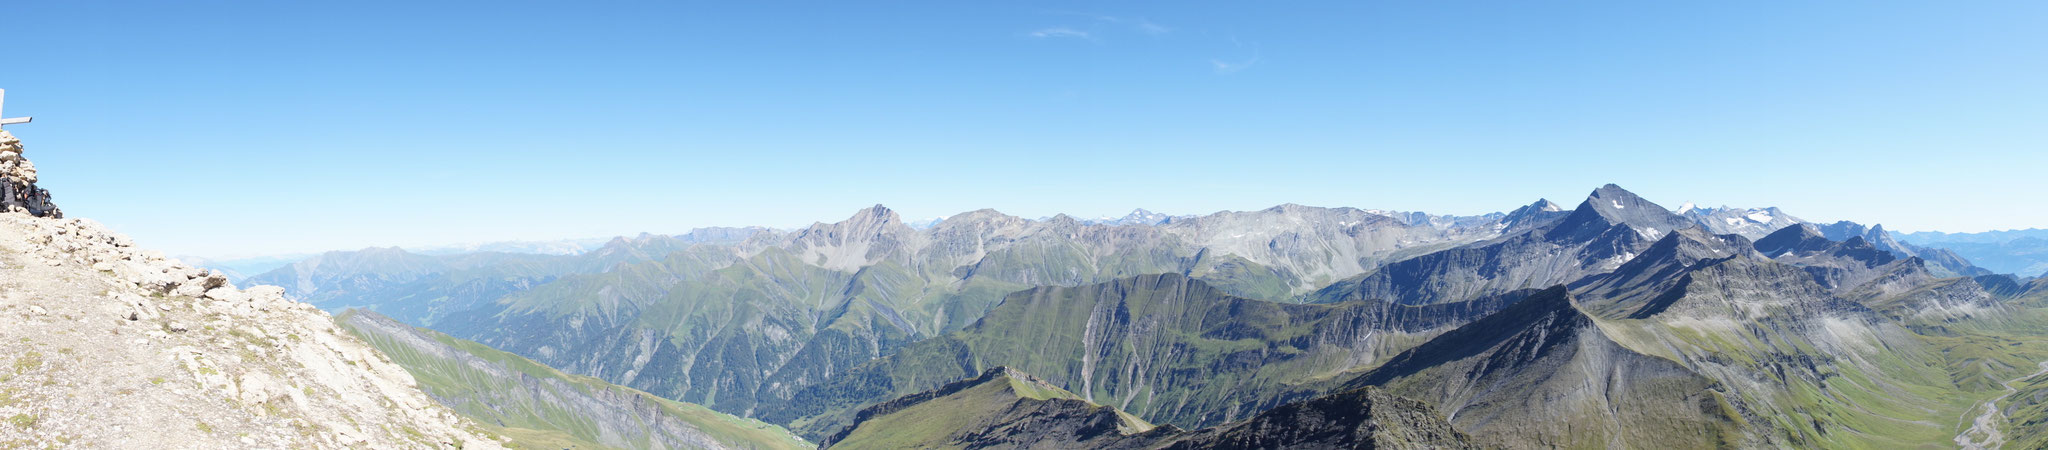 Piz Terri (grösster Gipfel rechts im Bild)